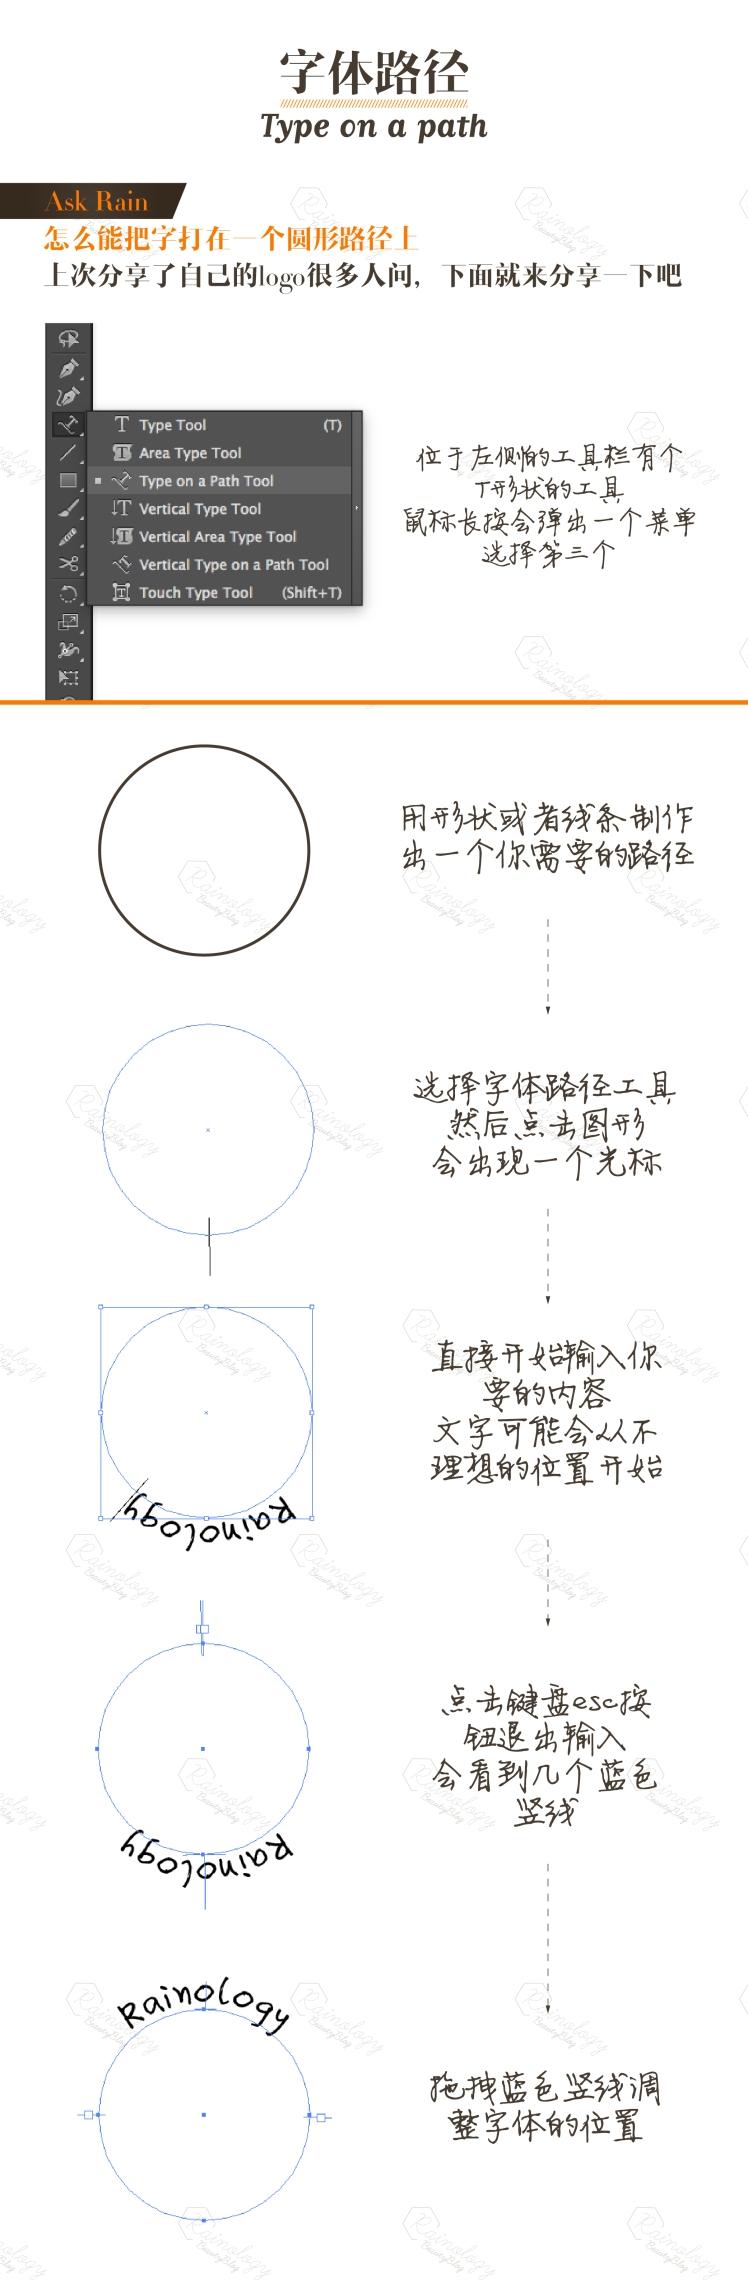 AI不完全教程 Vol2-07